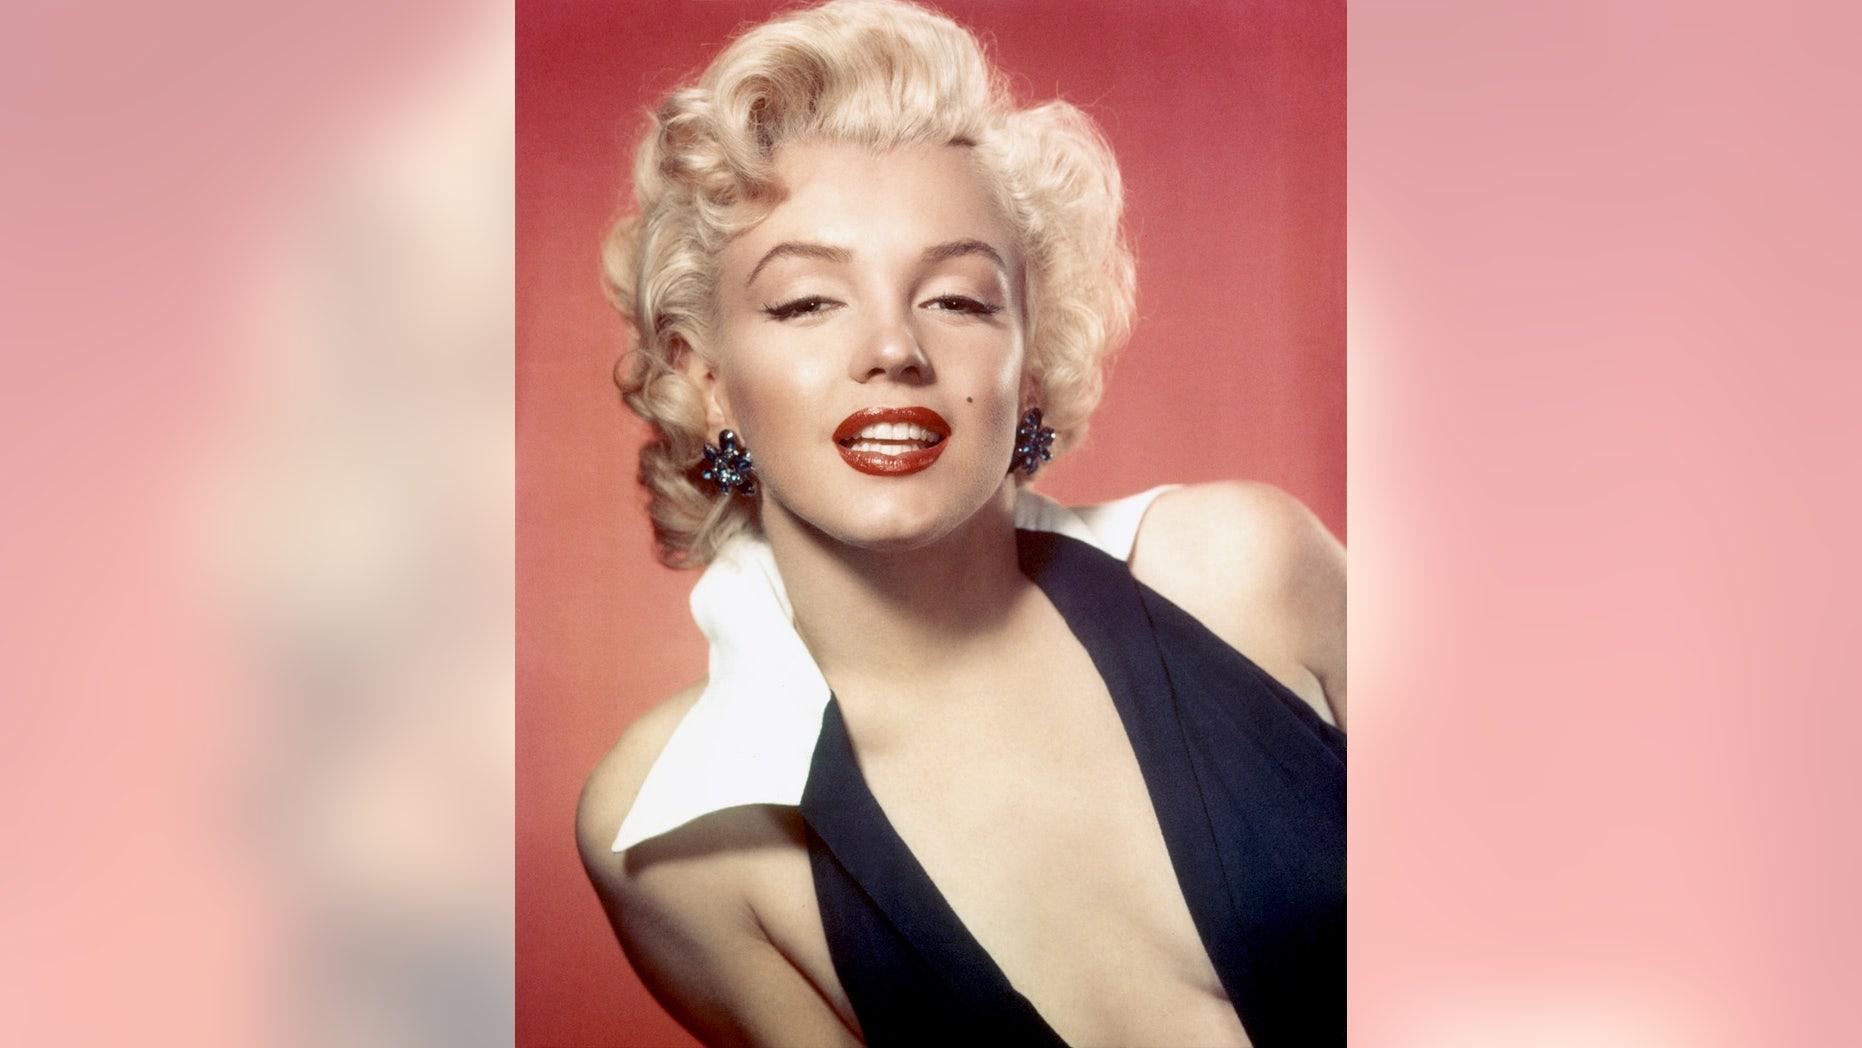 marilyn monroes birthday was june 1 1962